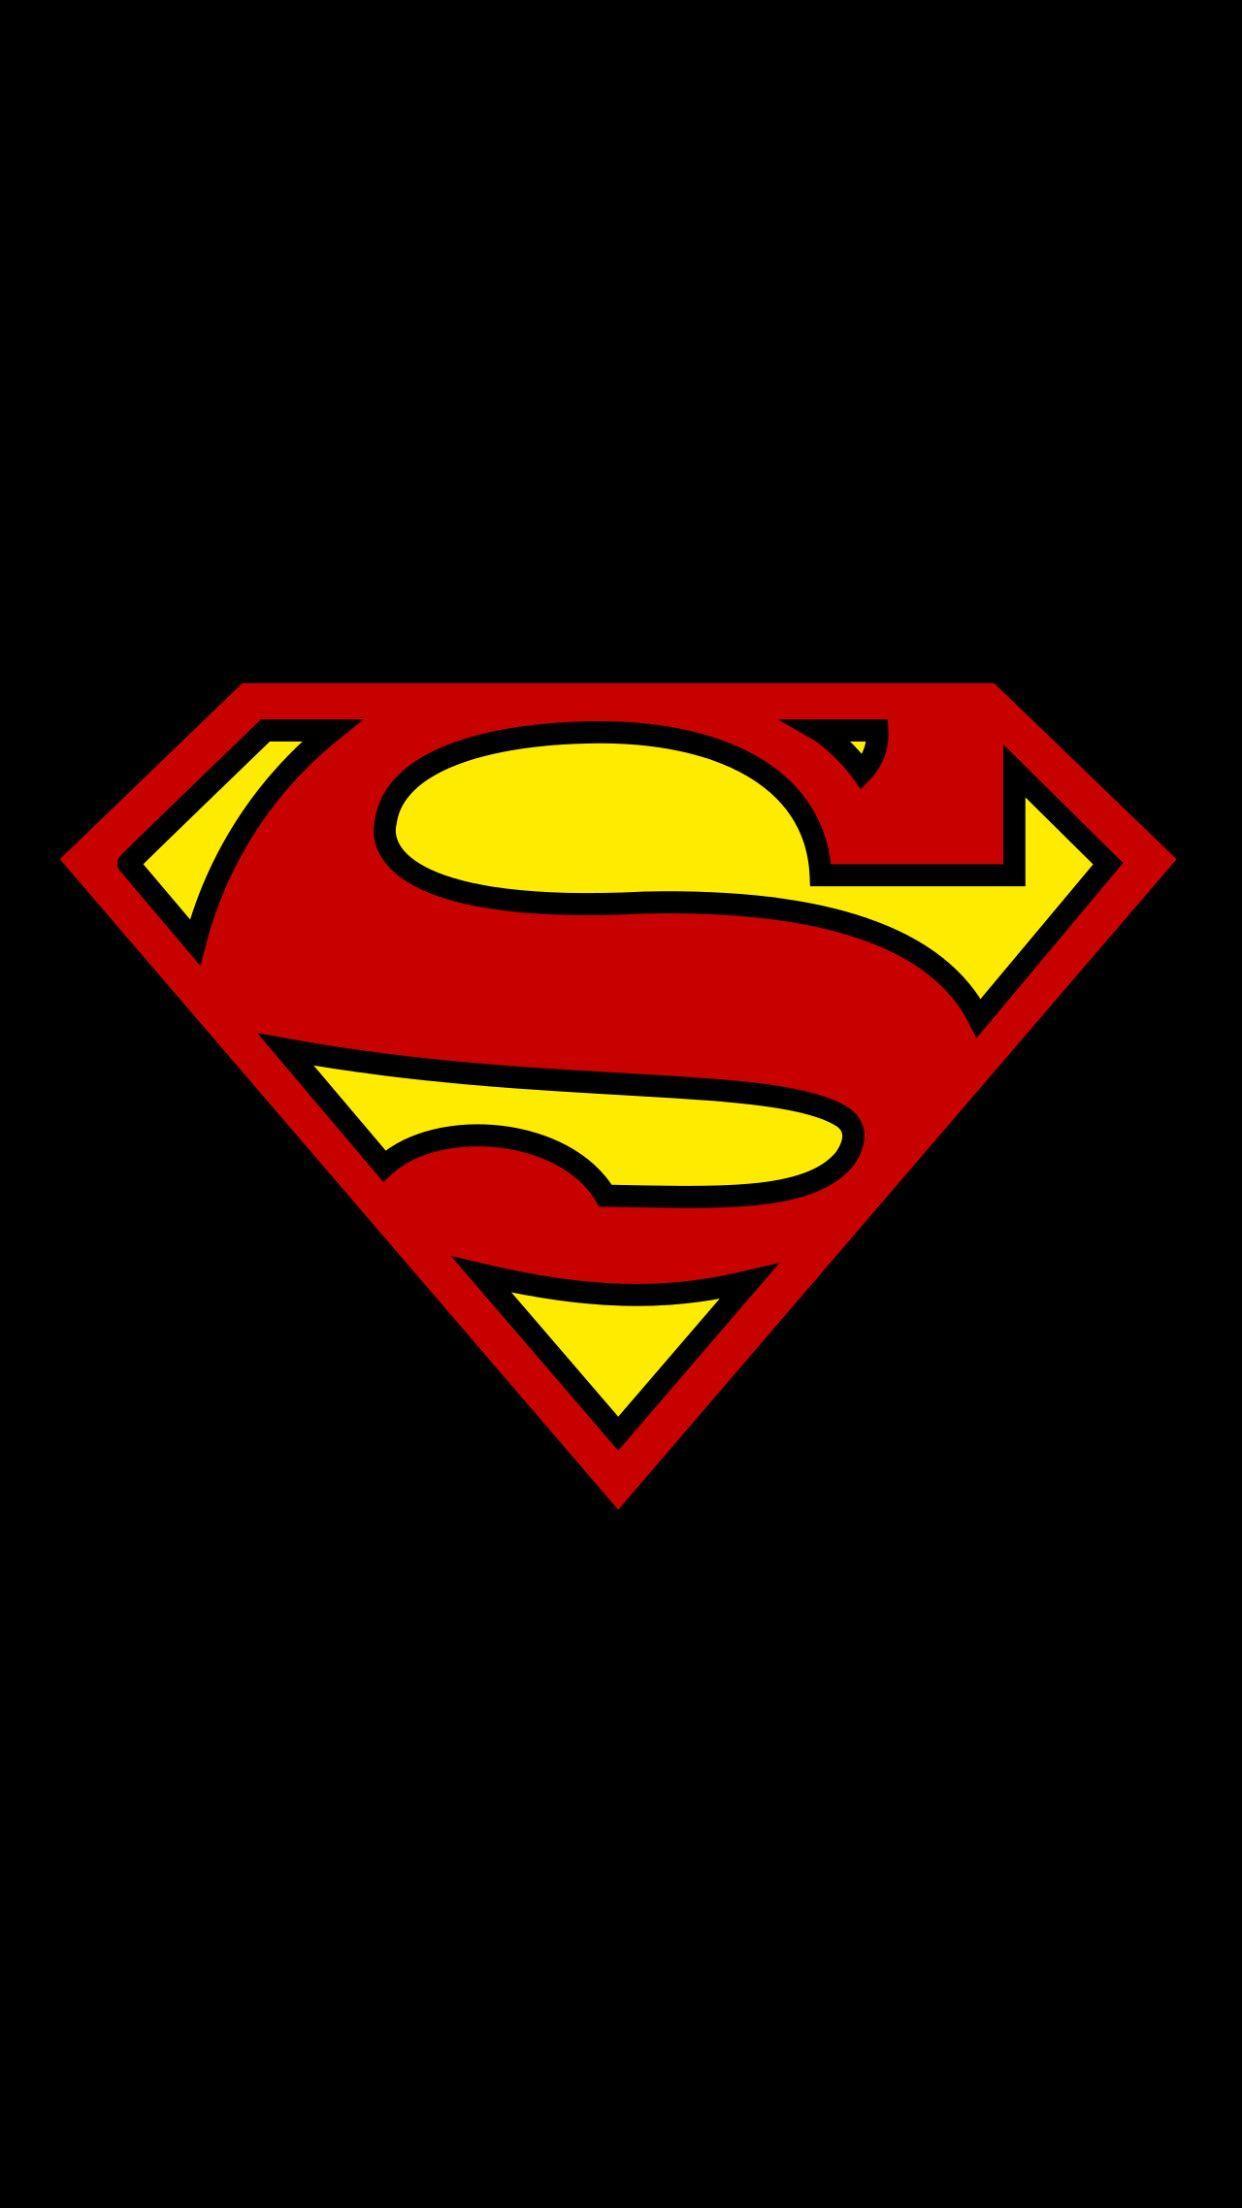 Superman Symbol Iphone Wallpapers Top Free Superman Symbol Iphone Backgrounds Wallpaperaccess